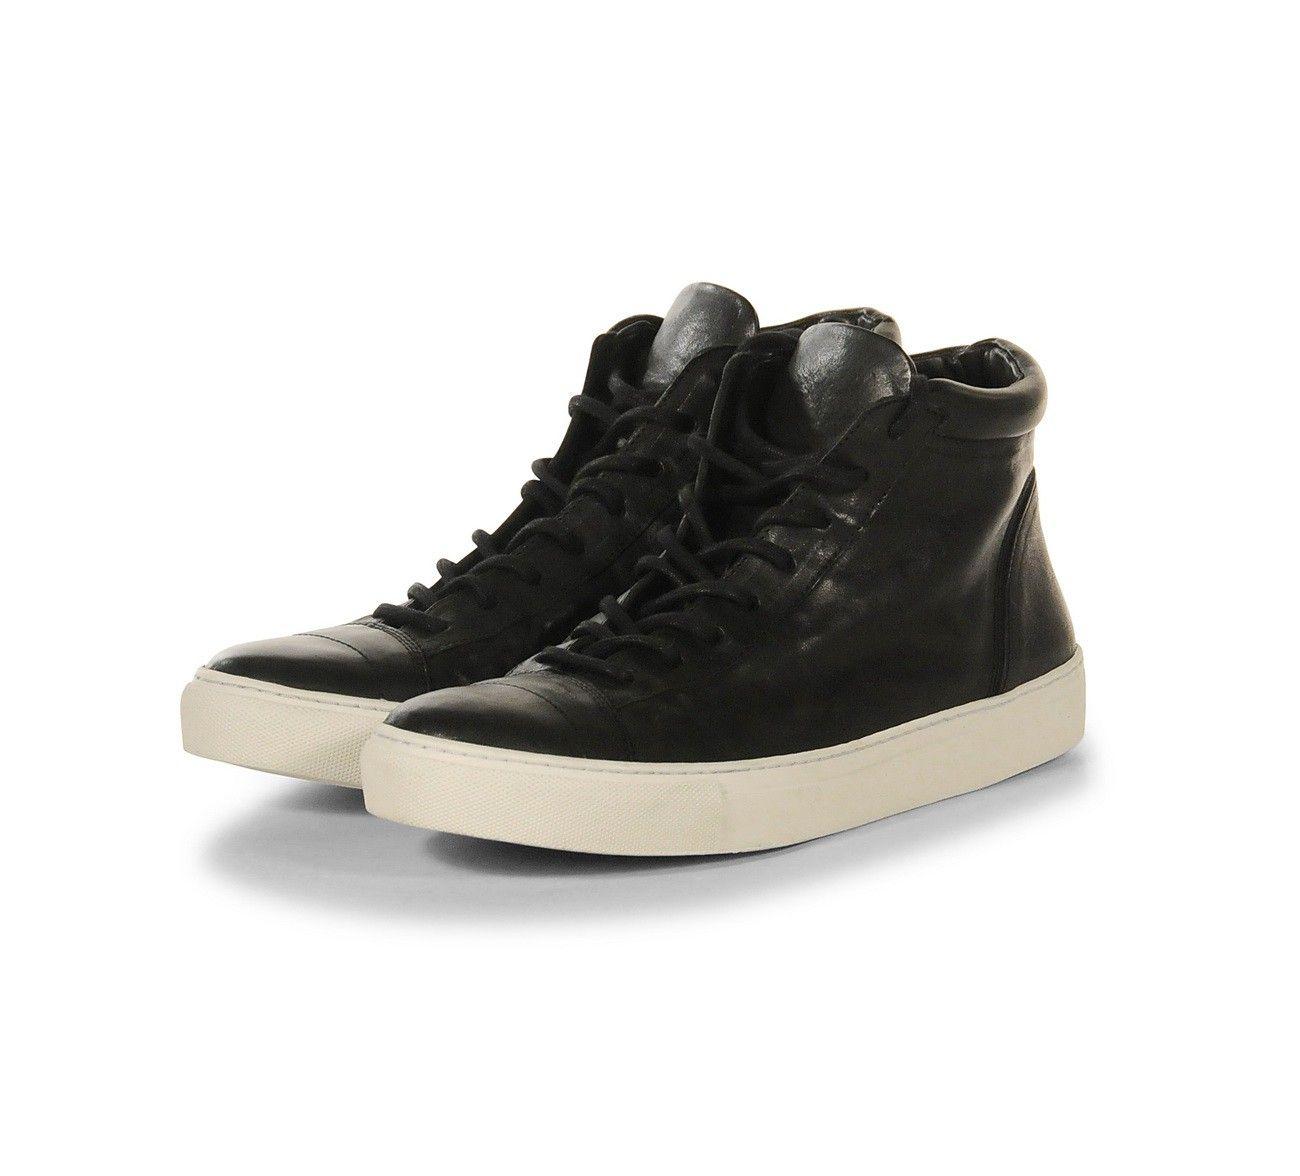 THE LAST CONSPIRACY - Herren Sneaker - Jorge - Horse Leather - Black/White